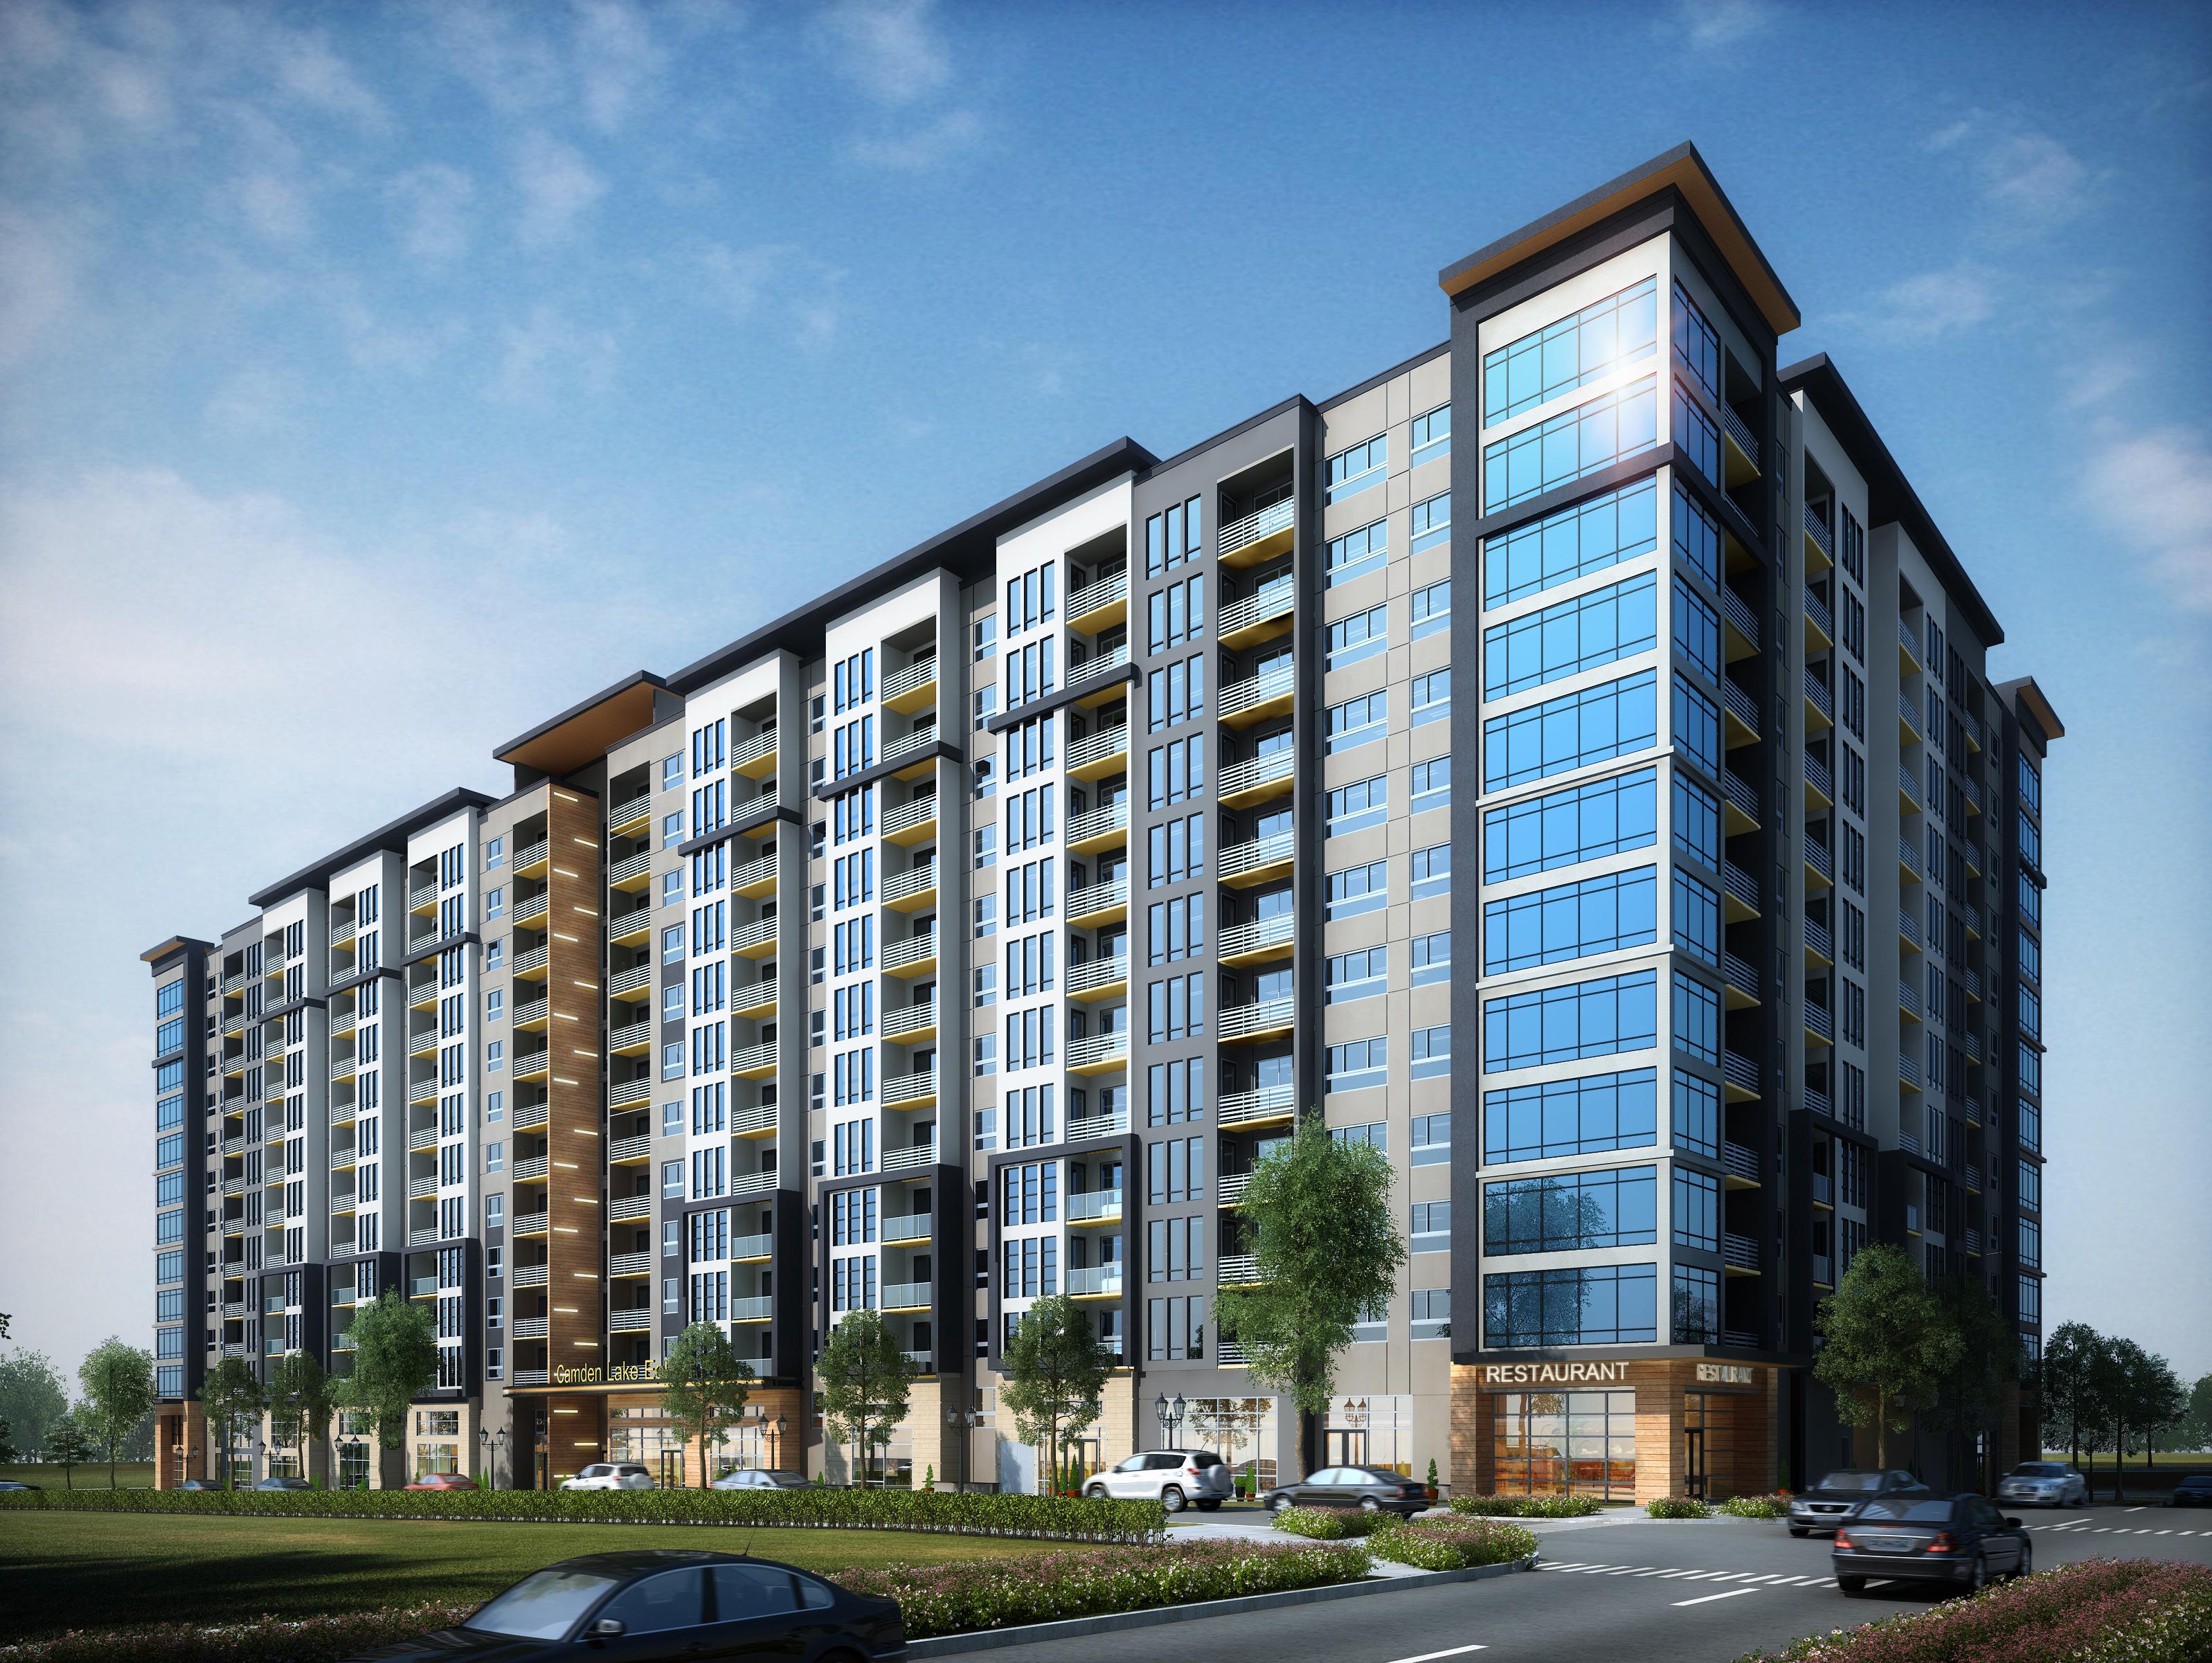 camden-lake-eola-apartments-orlando-florida-front.jpg